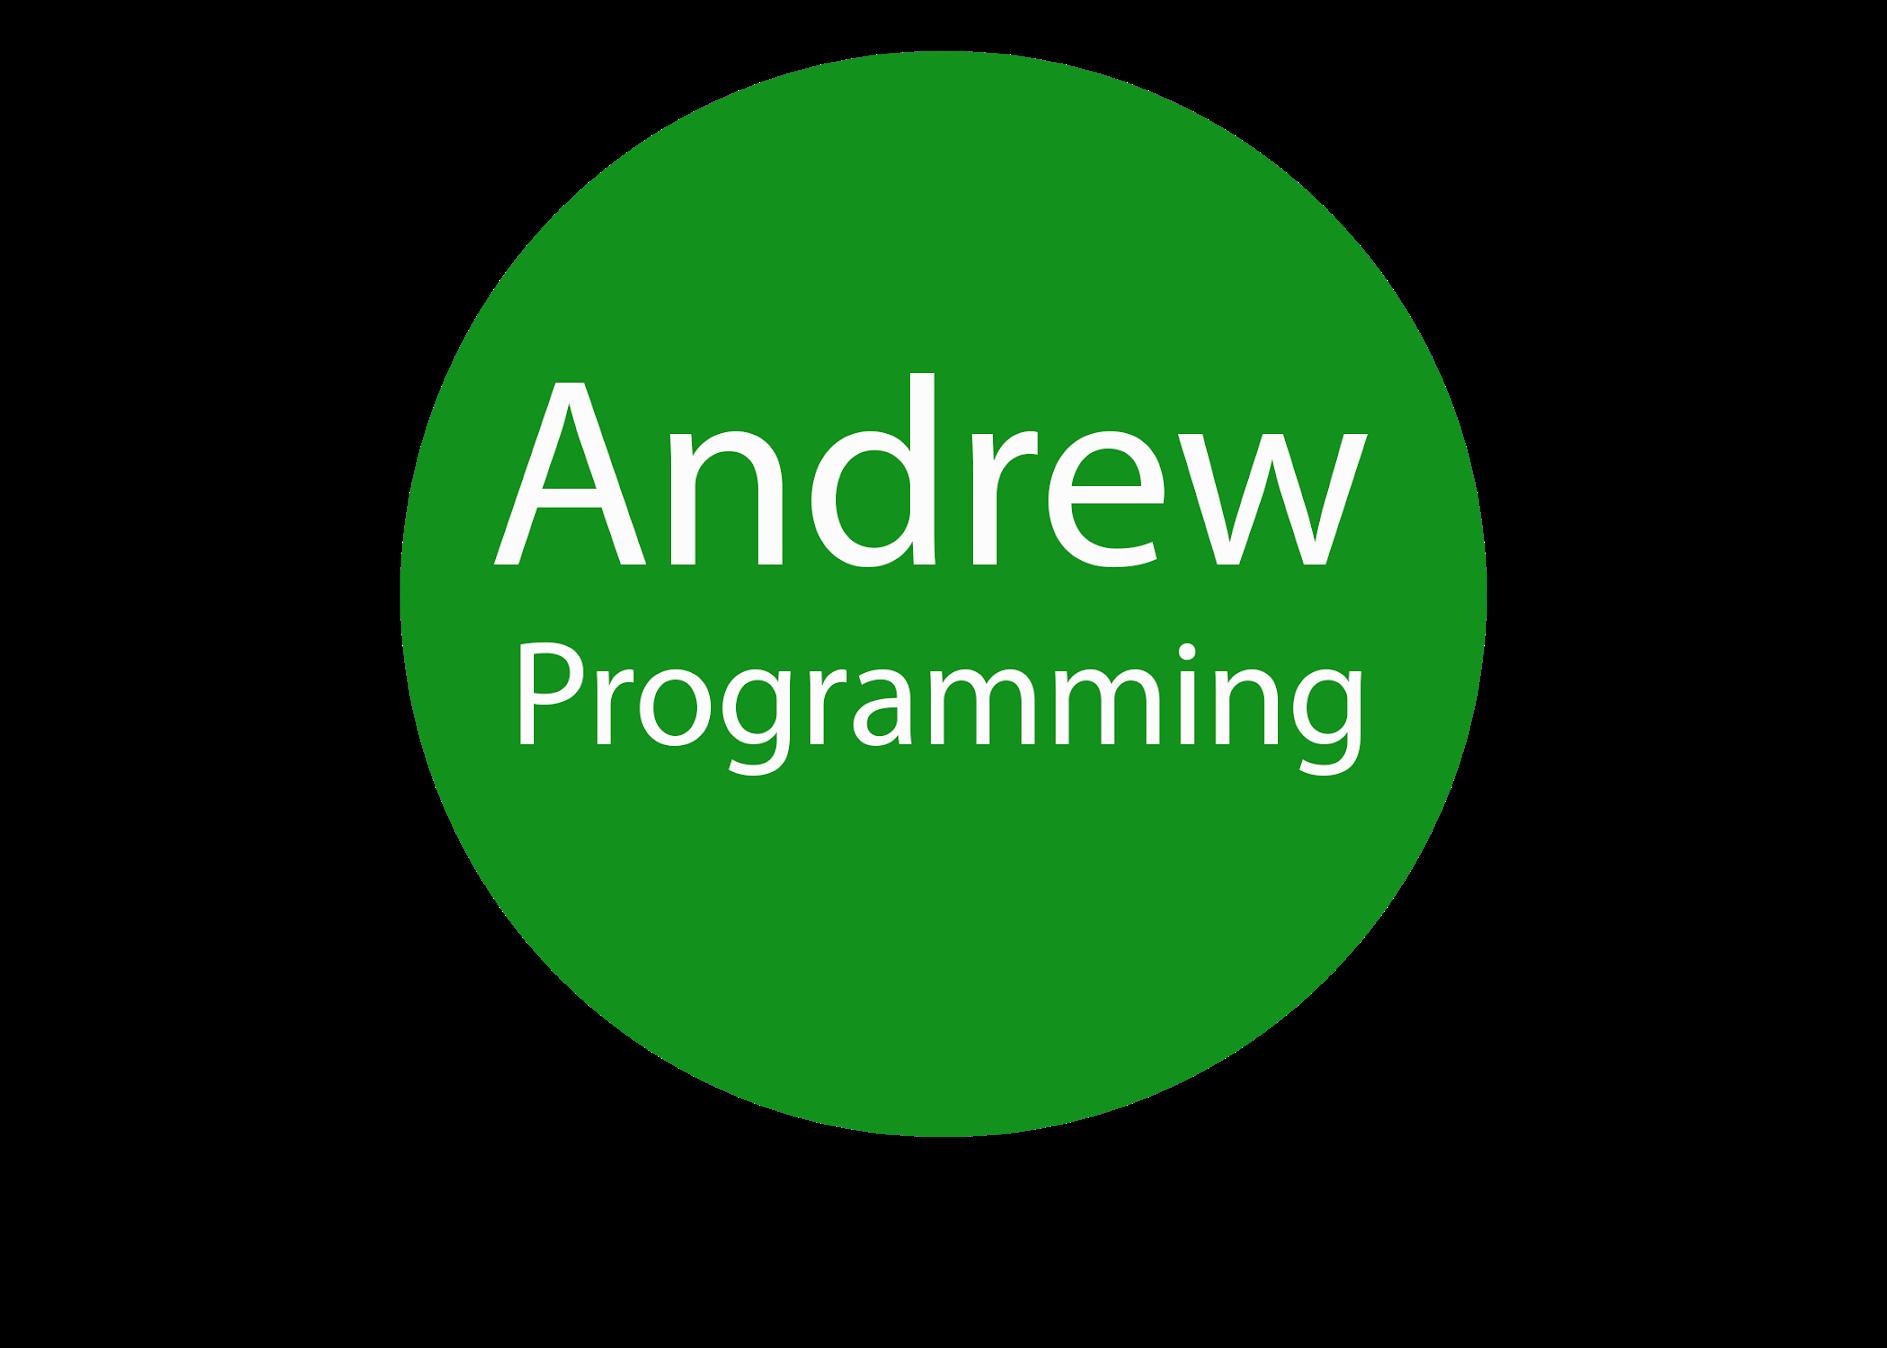 Andrew Programming